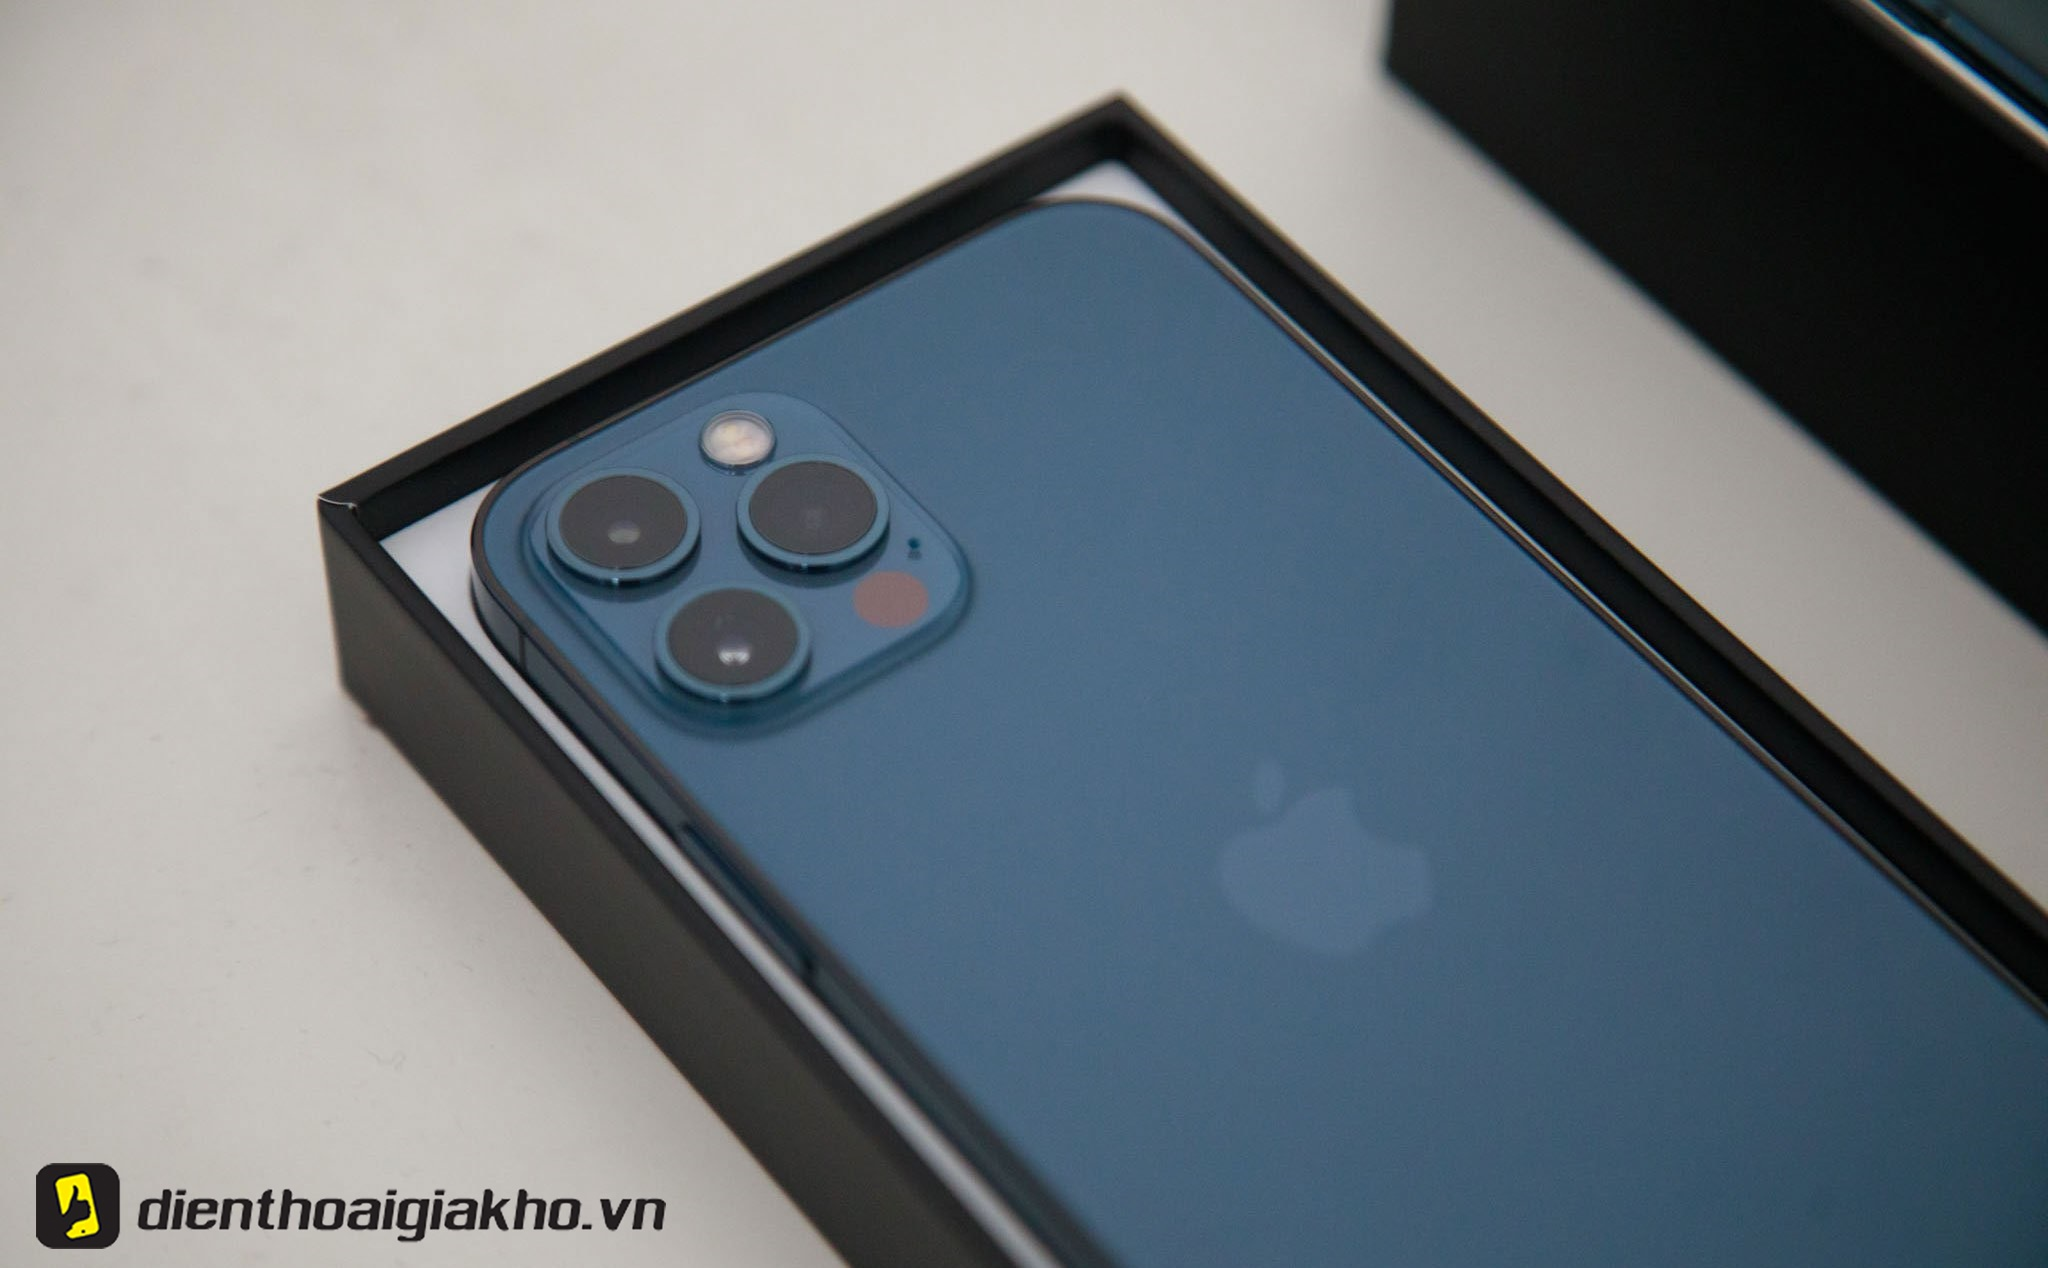 iphone-12-mau-nao-dep-nhat-cau-tra-loi-co-phai-la-mau-xanh-duong